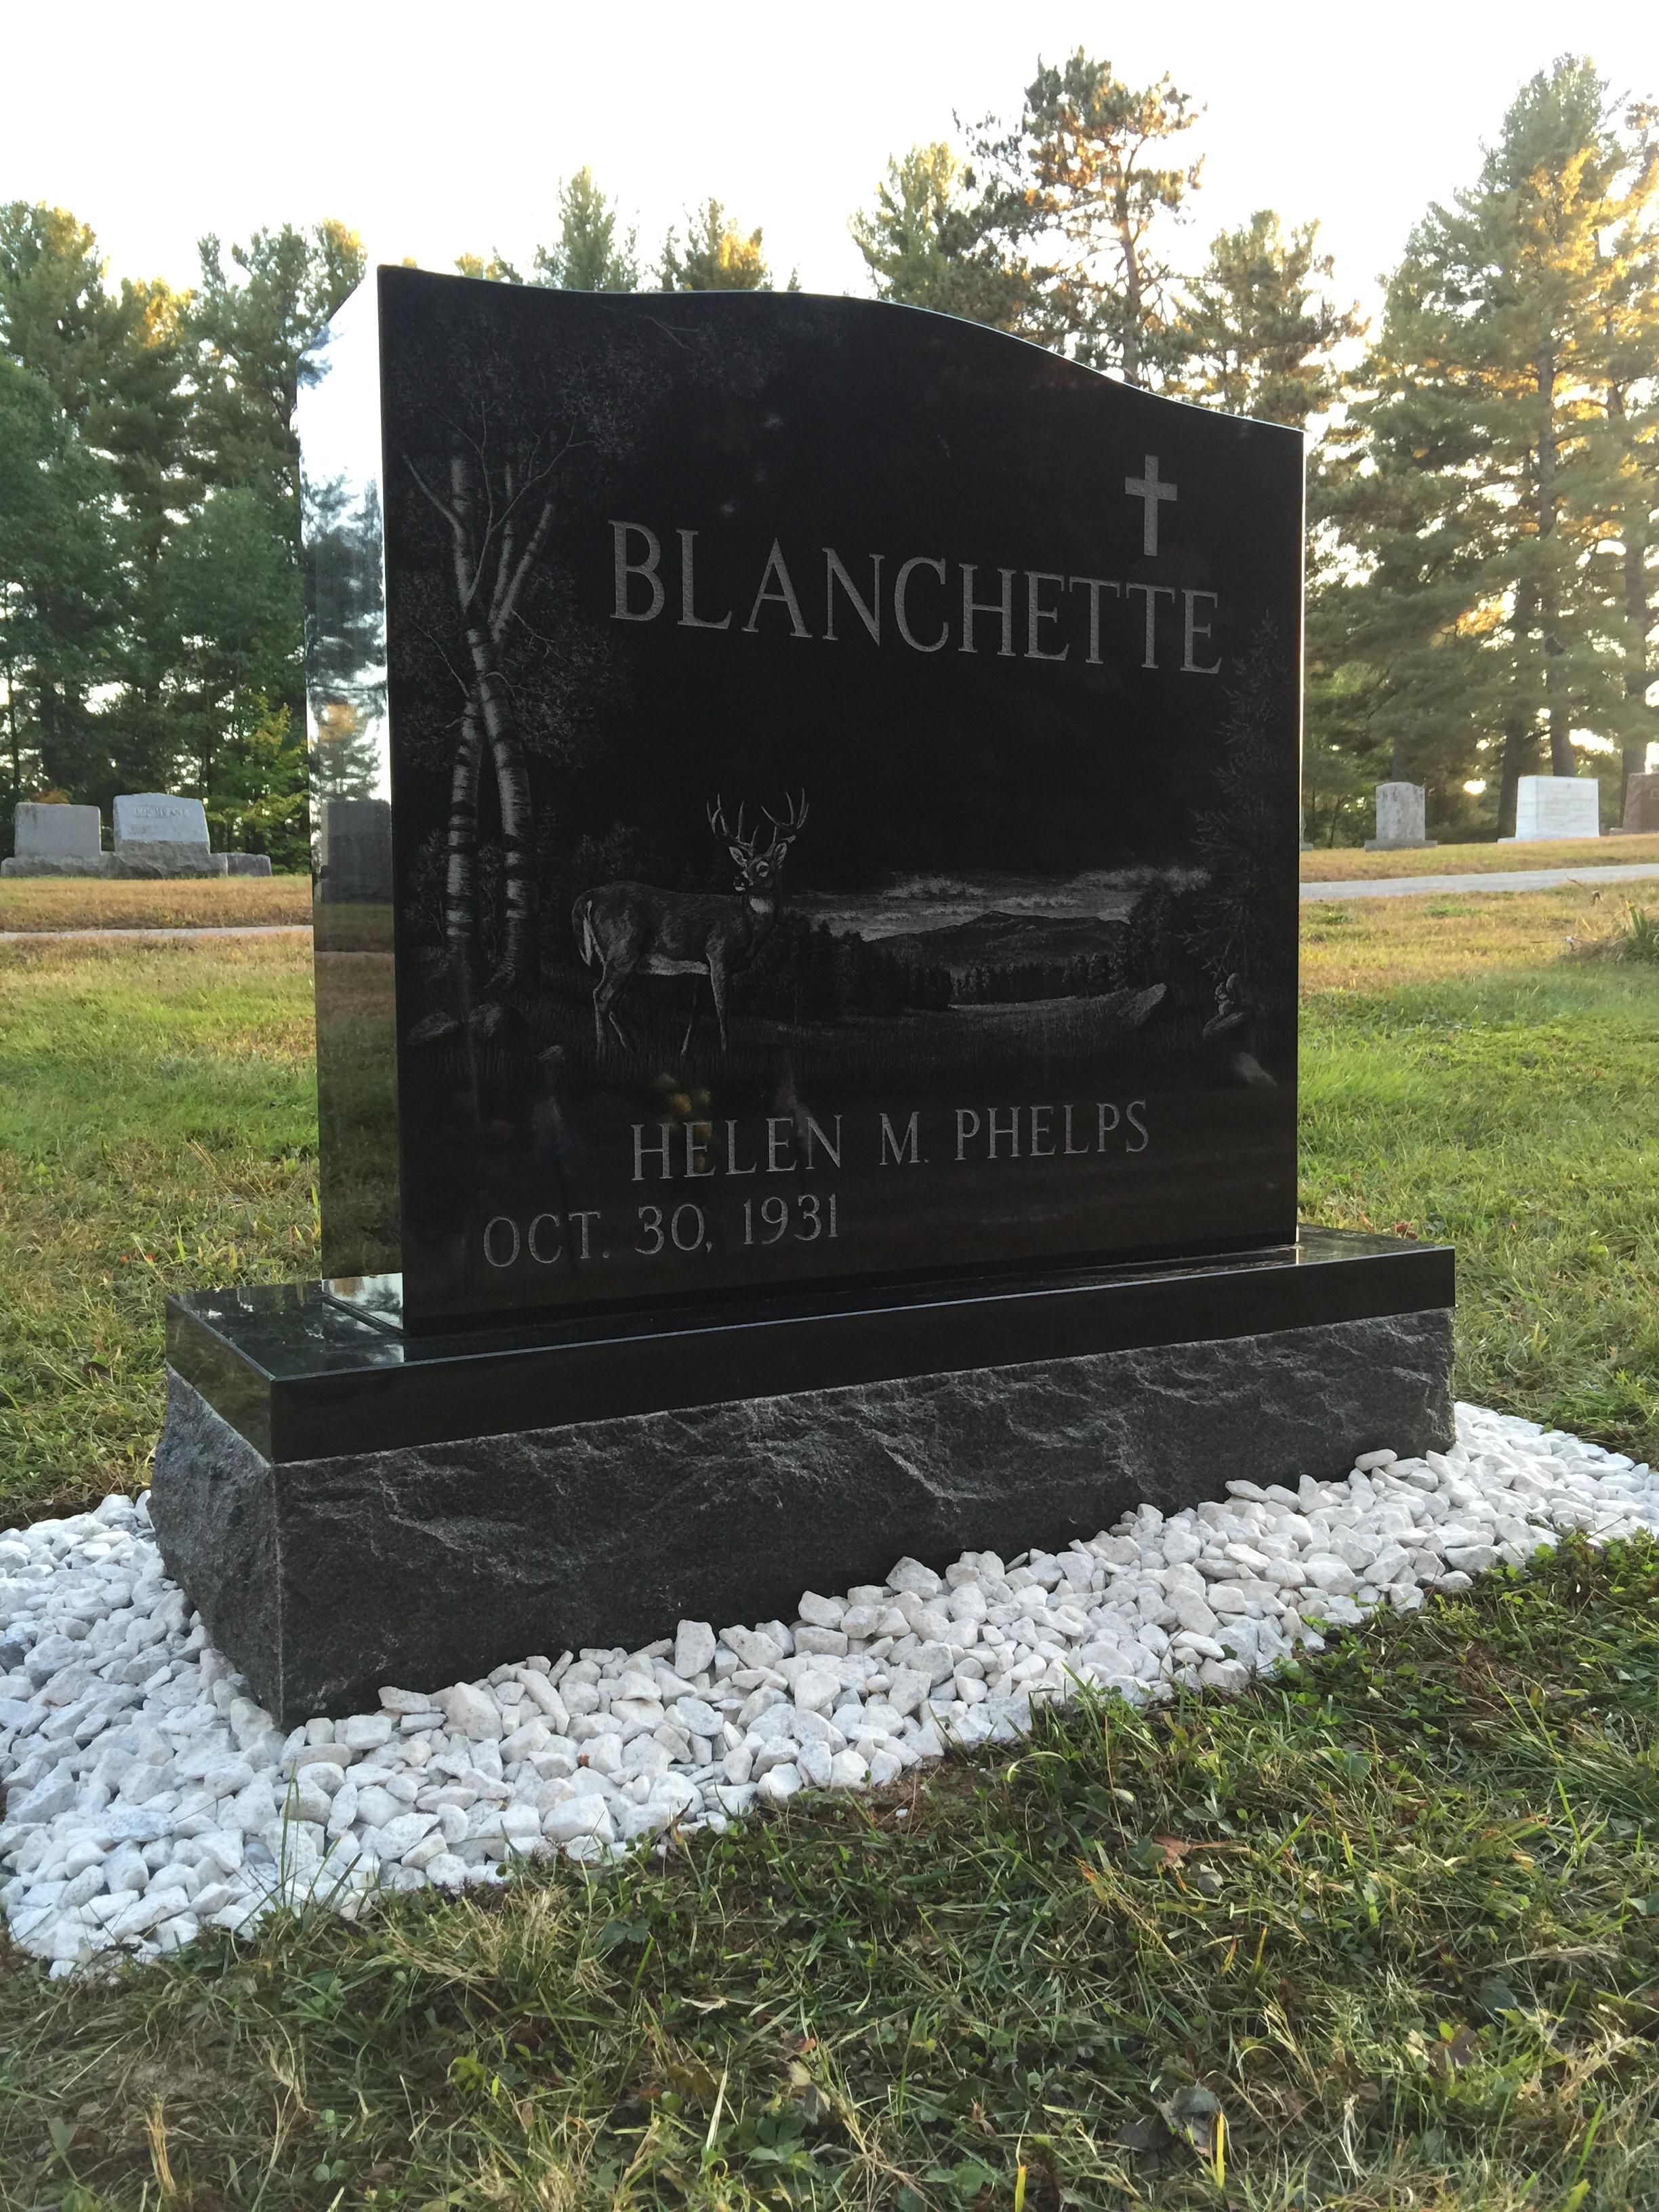 BLANCHETTE-PHELPSfinished 1.JPG